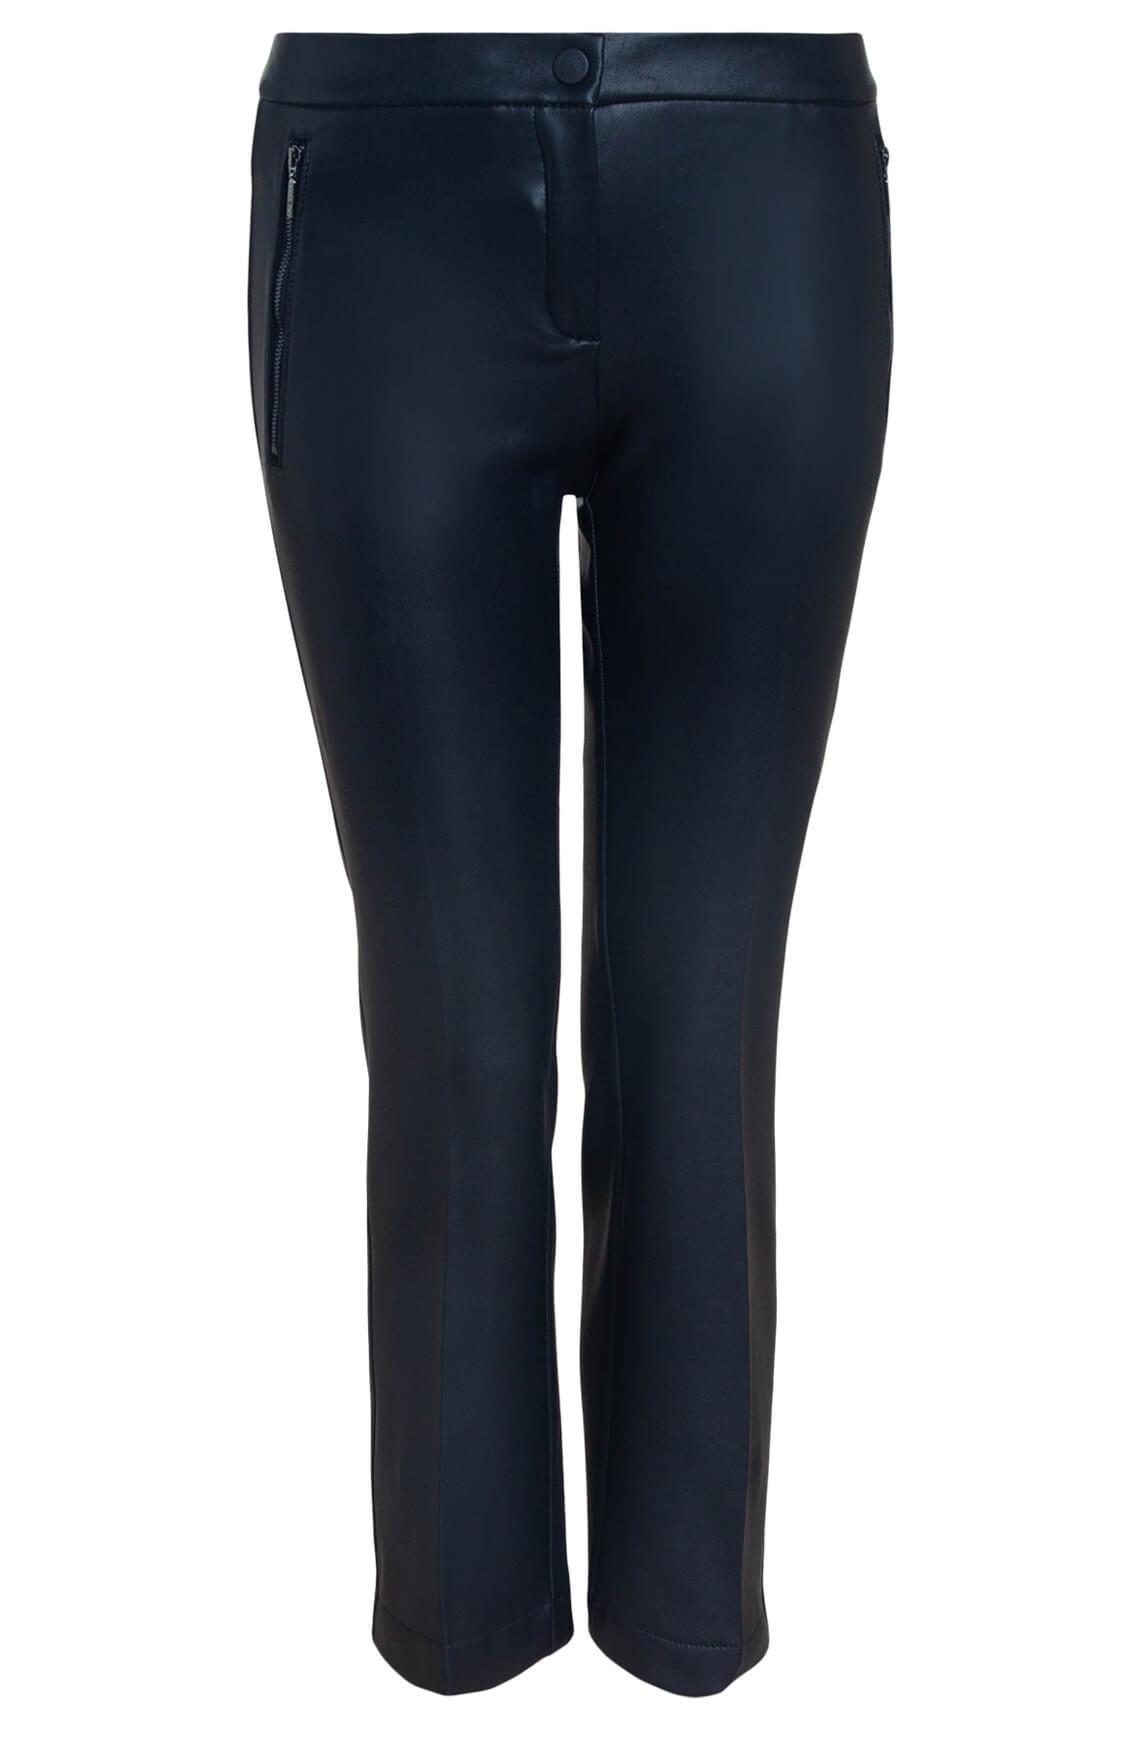 Rosner Dames L28 Antonia vegan leather broek zwart